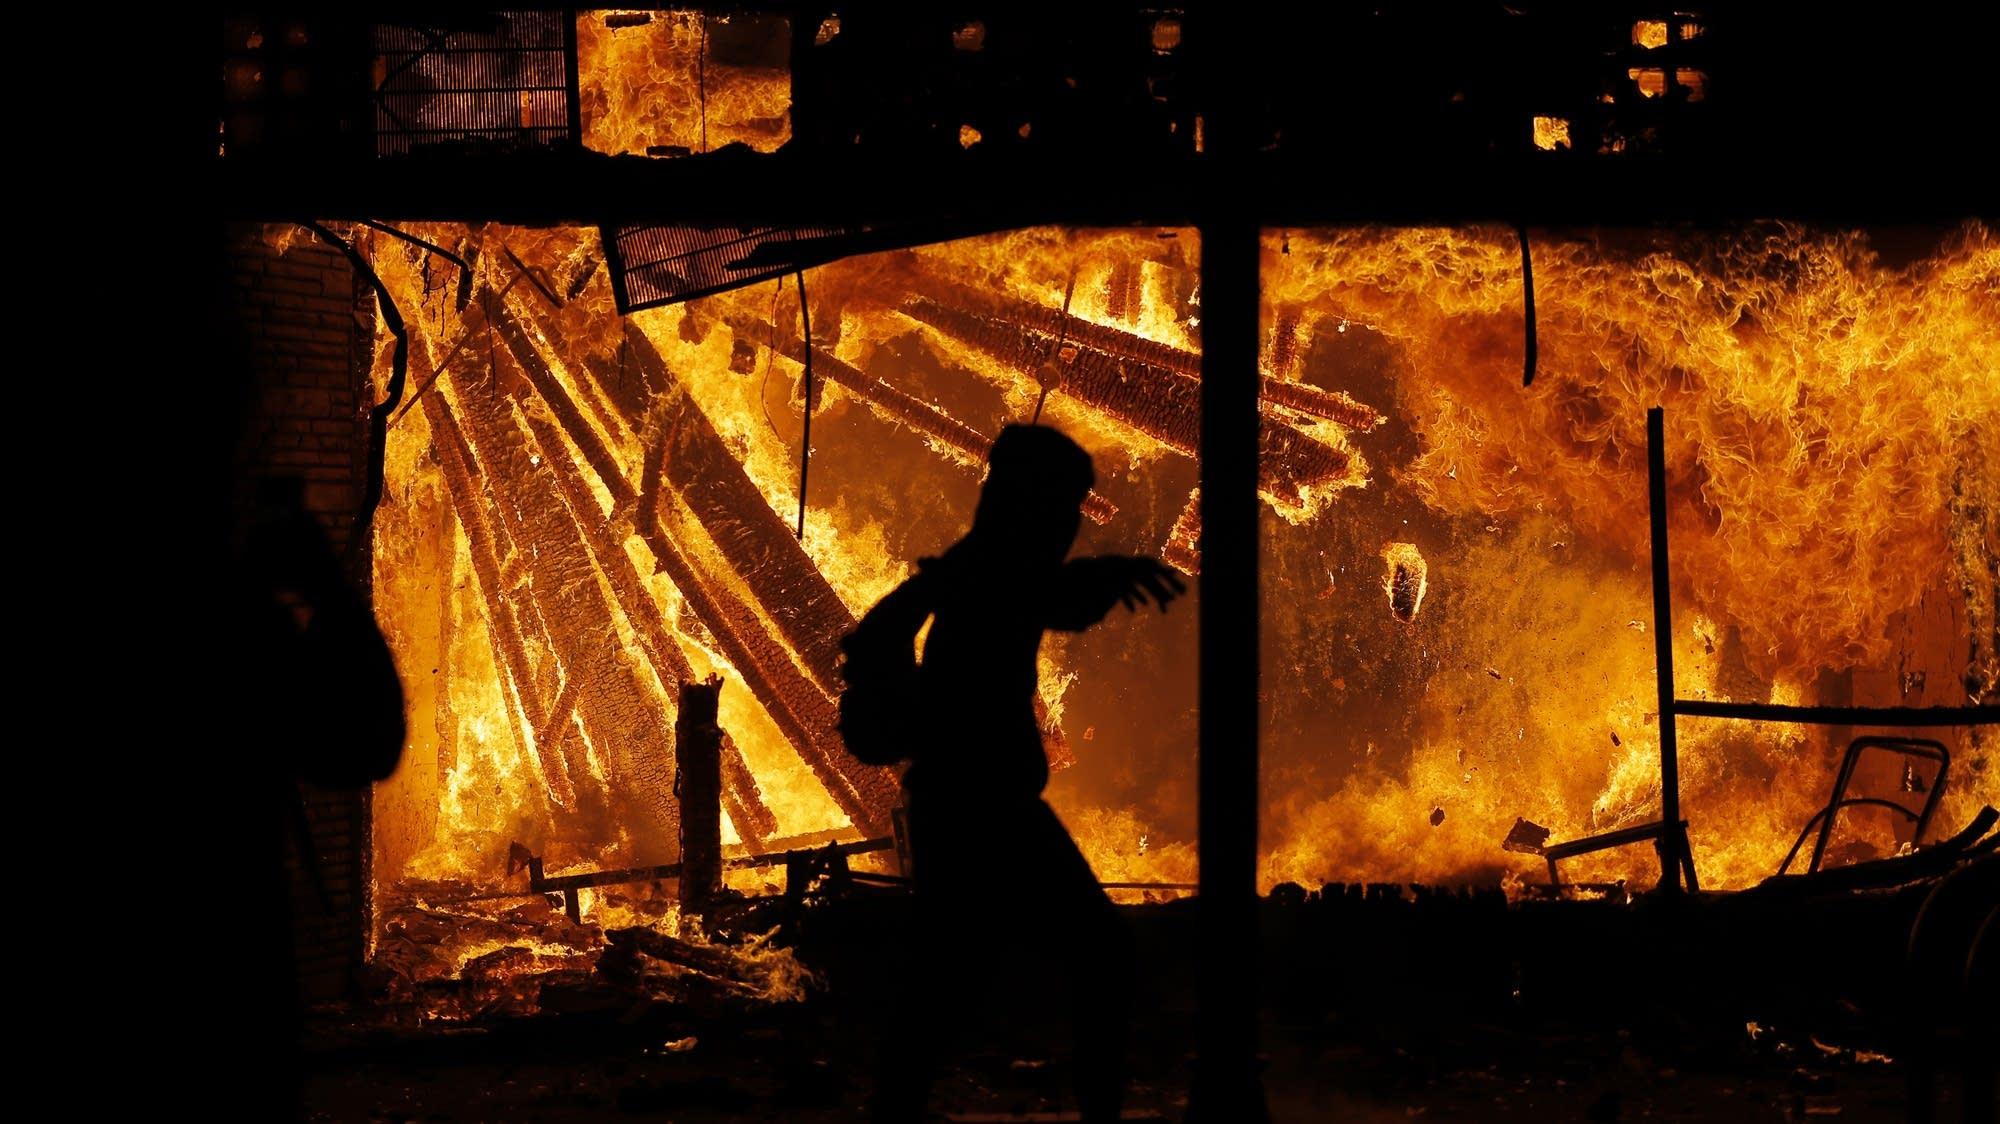 85a984 20200529 floyd protest fire ap01